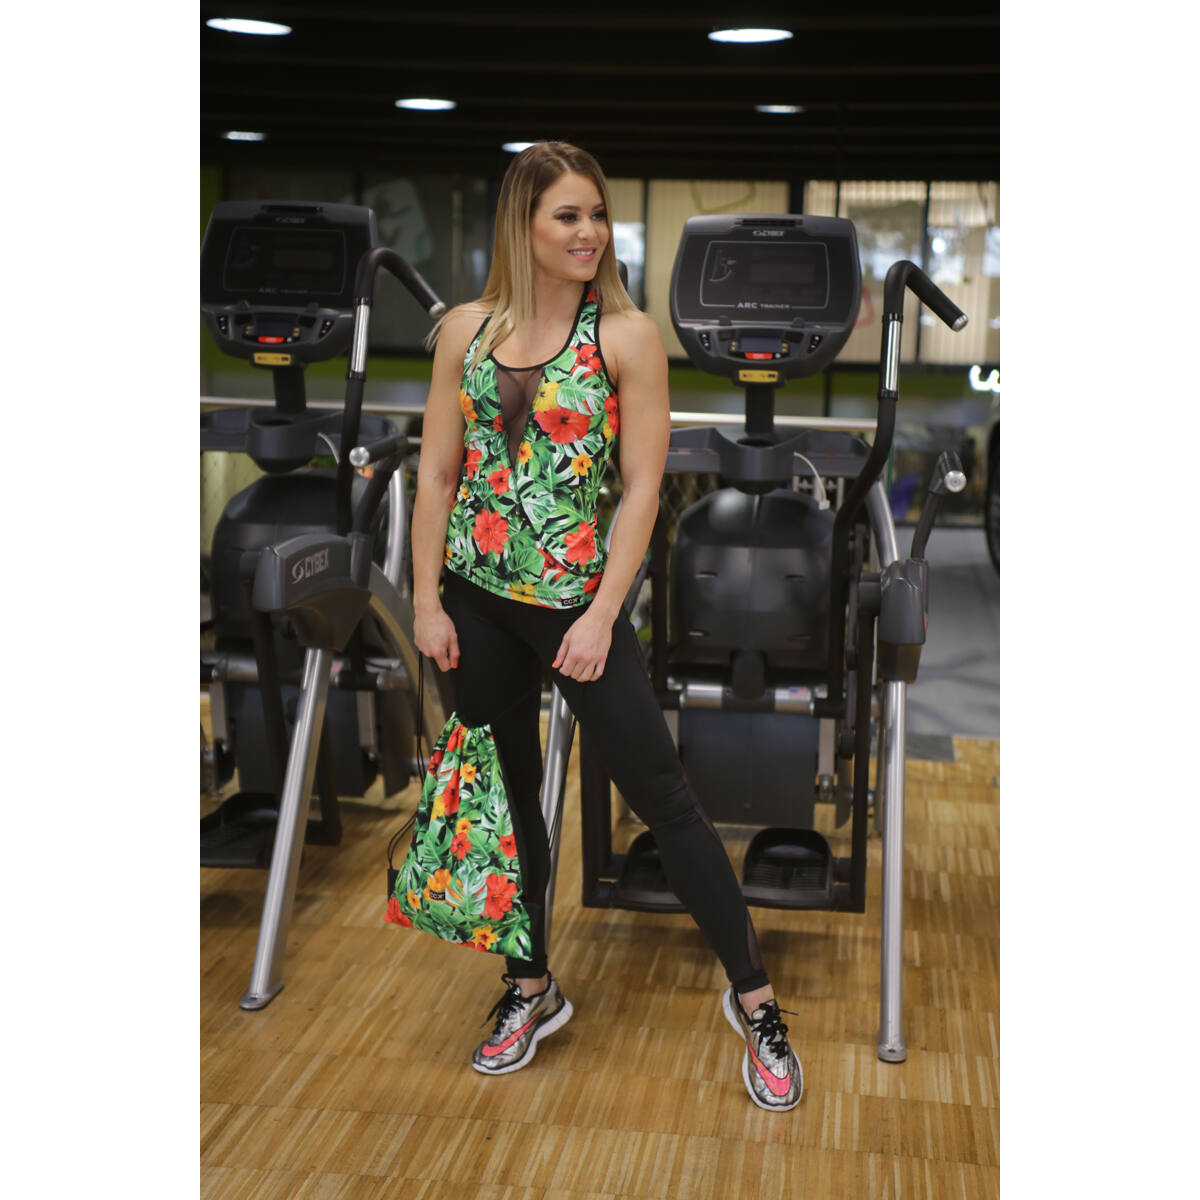 Flame fekete női fitness tüll leggings + jungle atléta szett